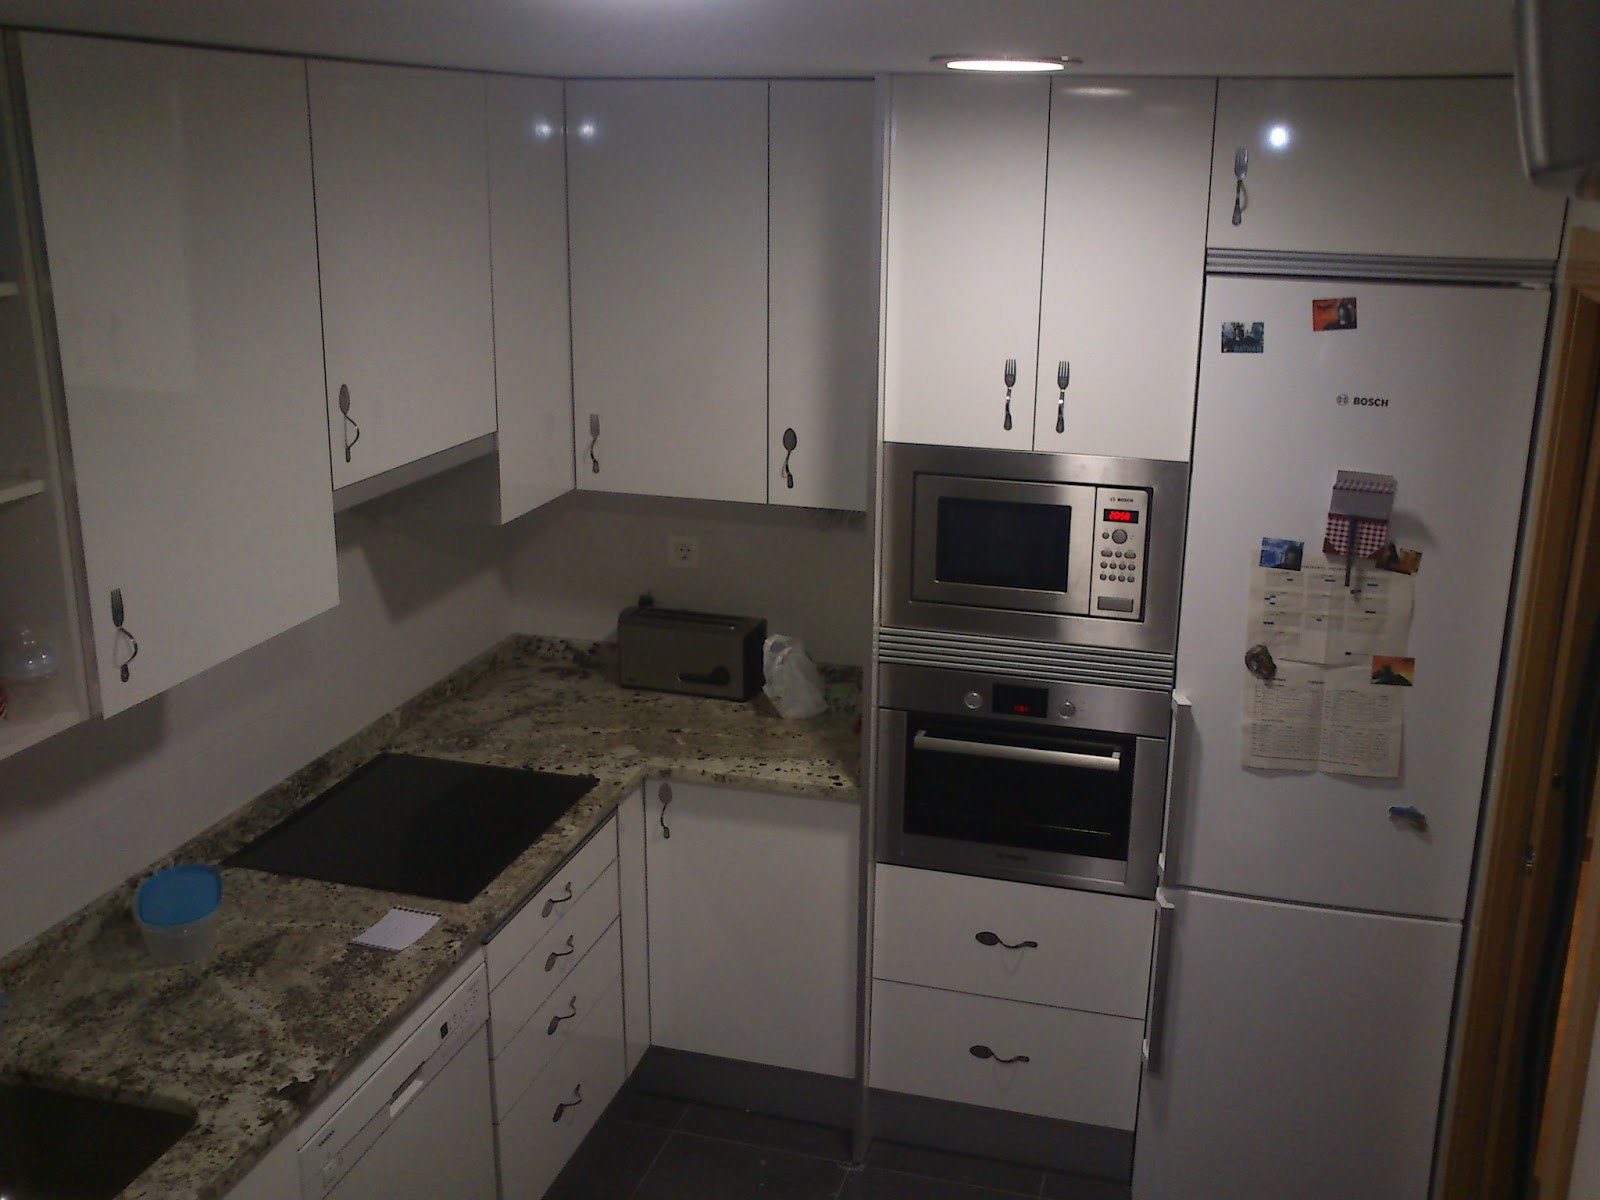 Sergio vivas carpintero colocaci n de cocina blanca for Muebles de cocina huesca